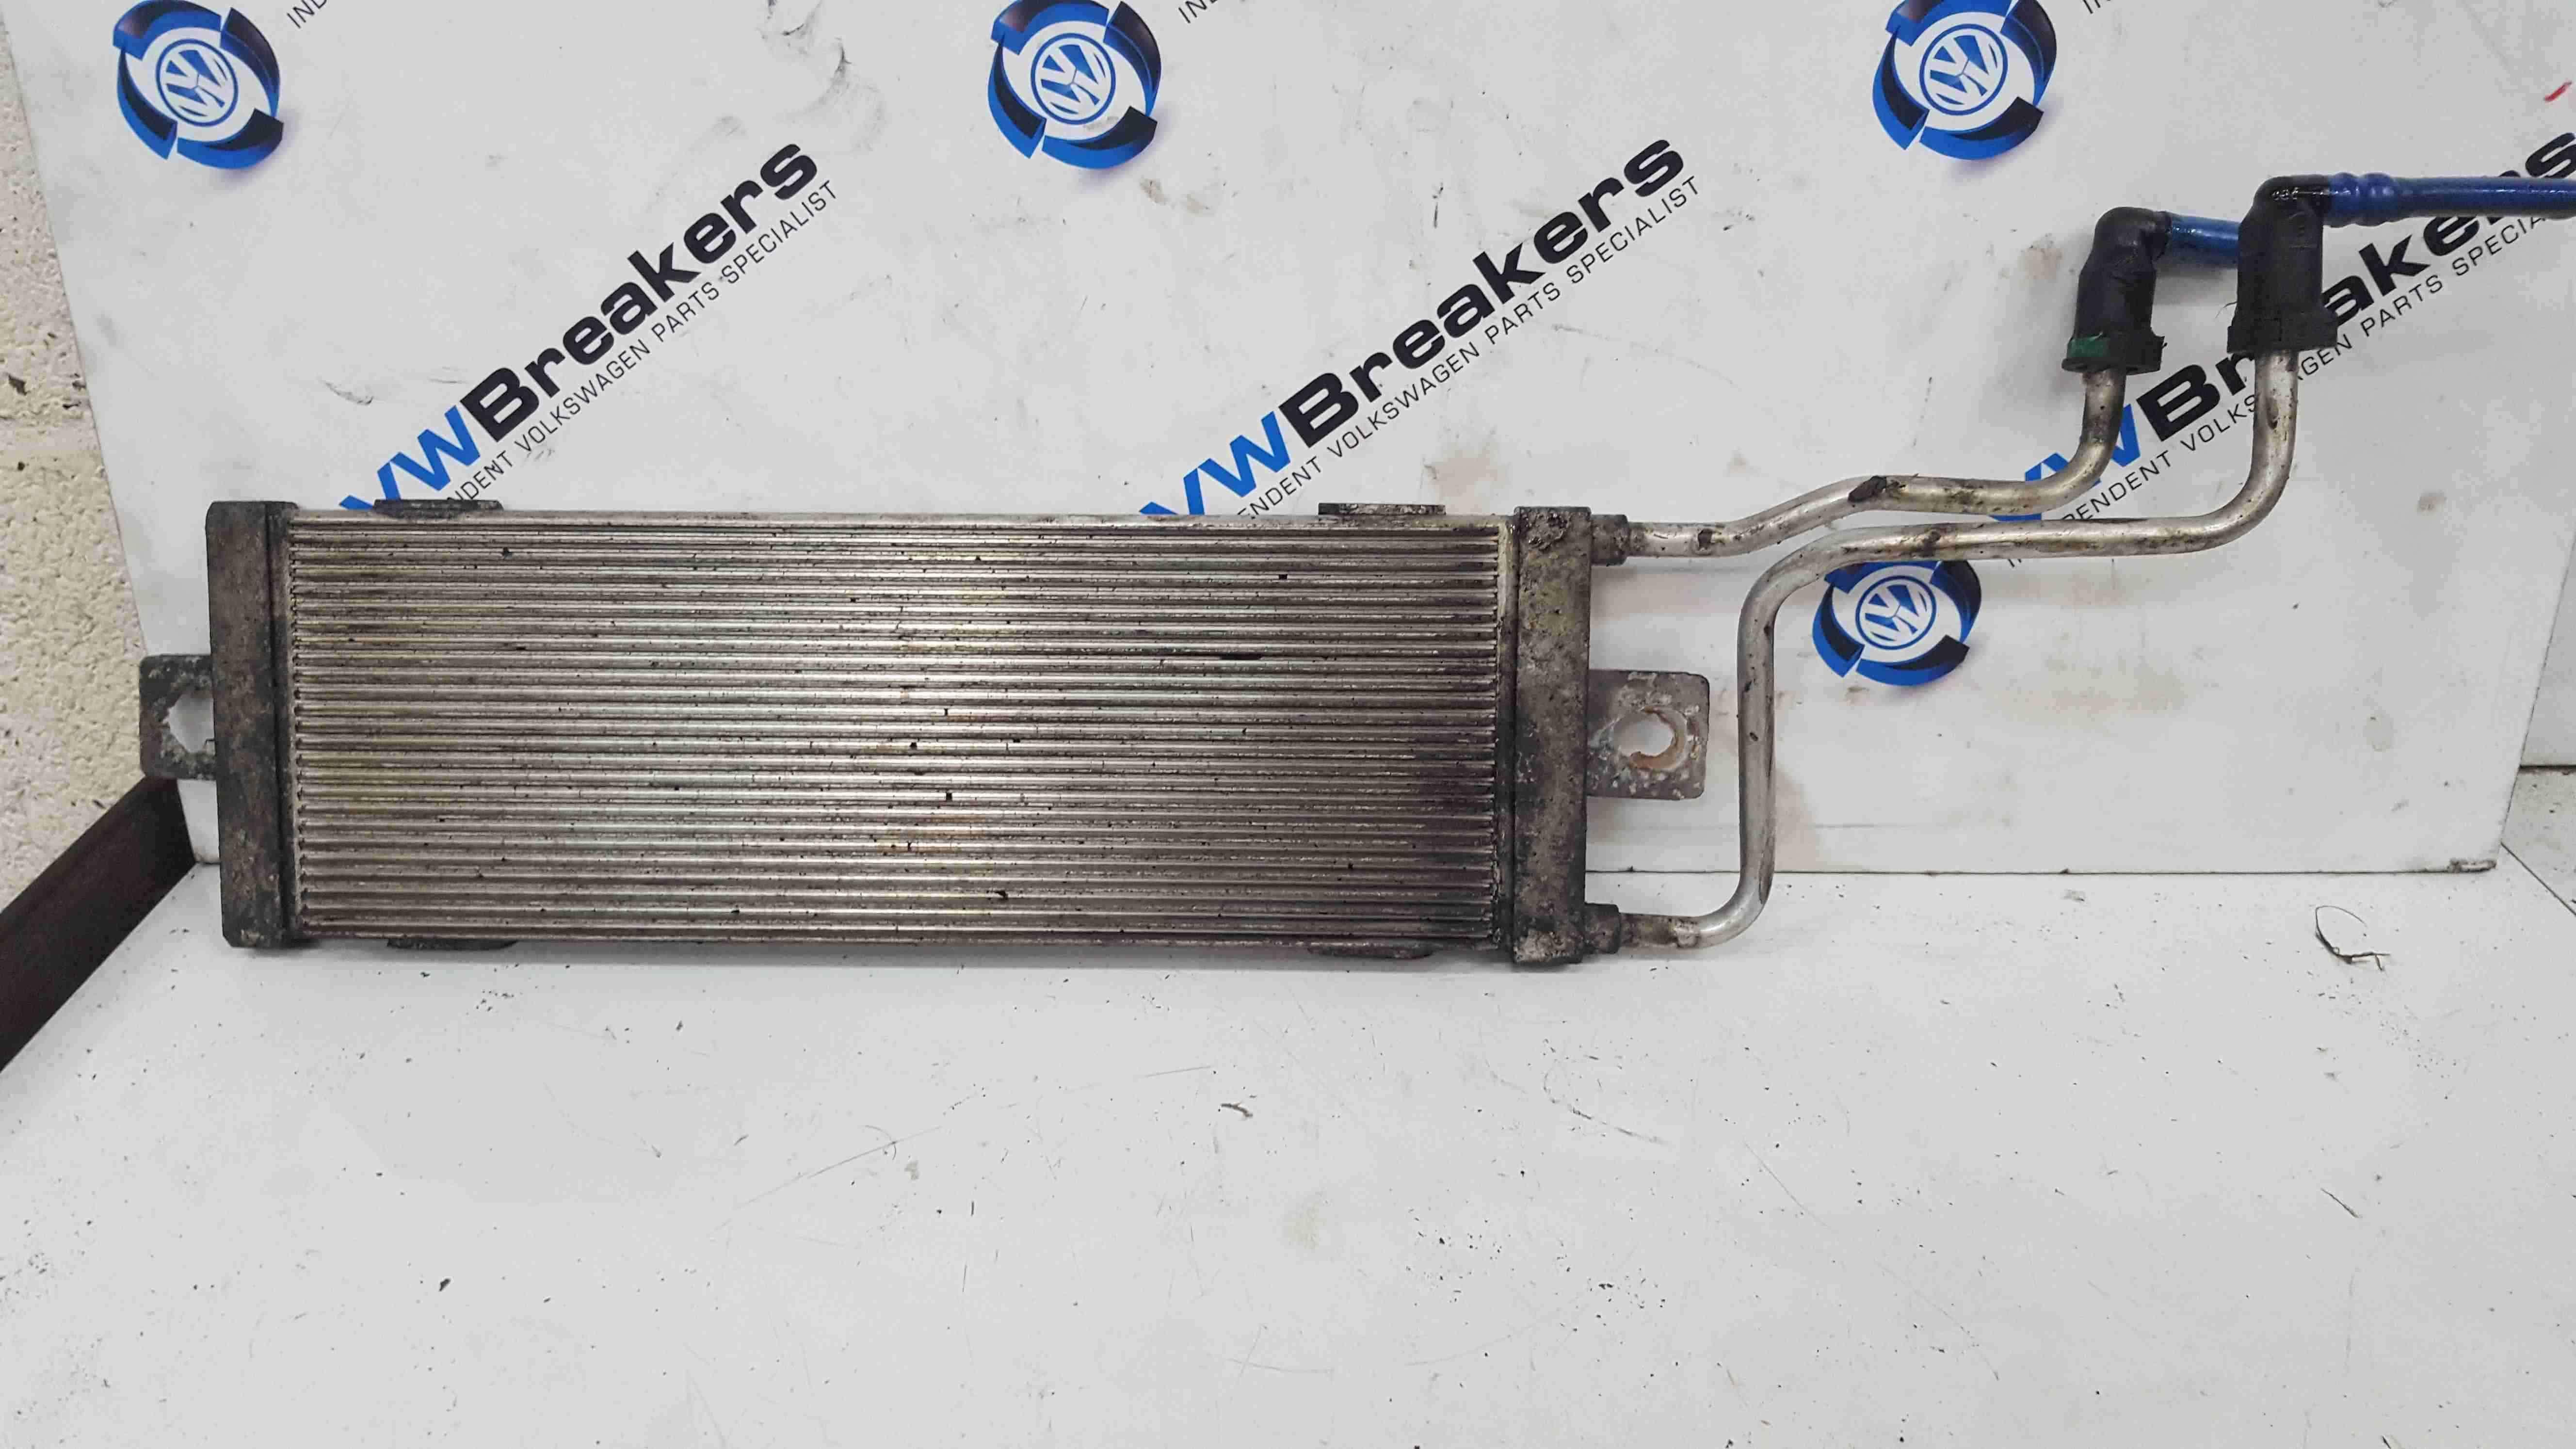 Volkswagen Beetle 1998-2006 1.9 TDi Diesel Fuel Cooler 1J0201894A